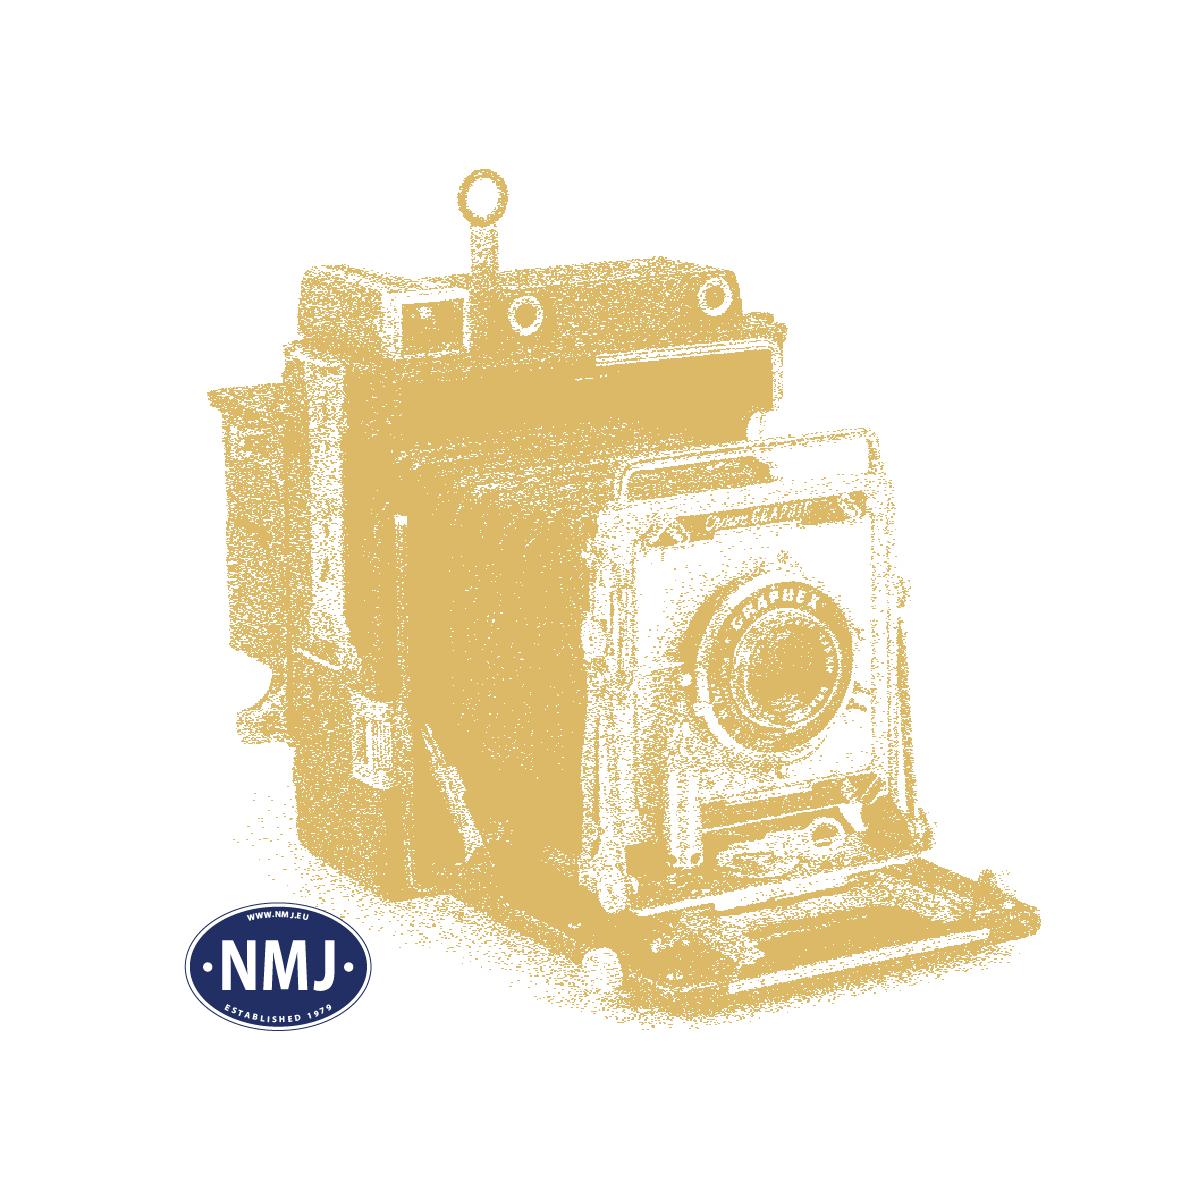 NMJT105.302 - NMJ Topline NSB A2 24005 Nydesign